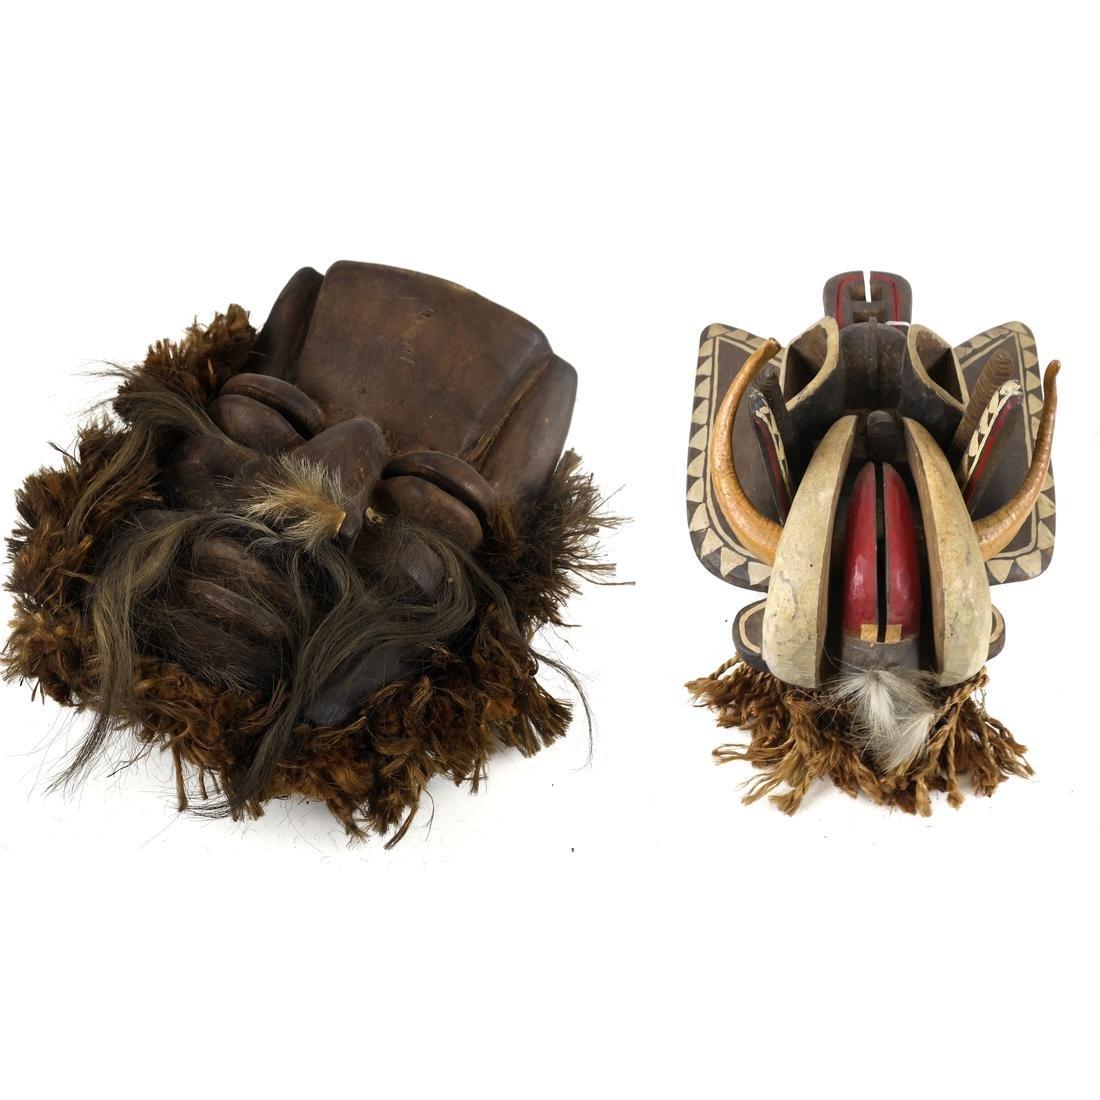 Two Ethnic Masks